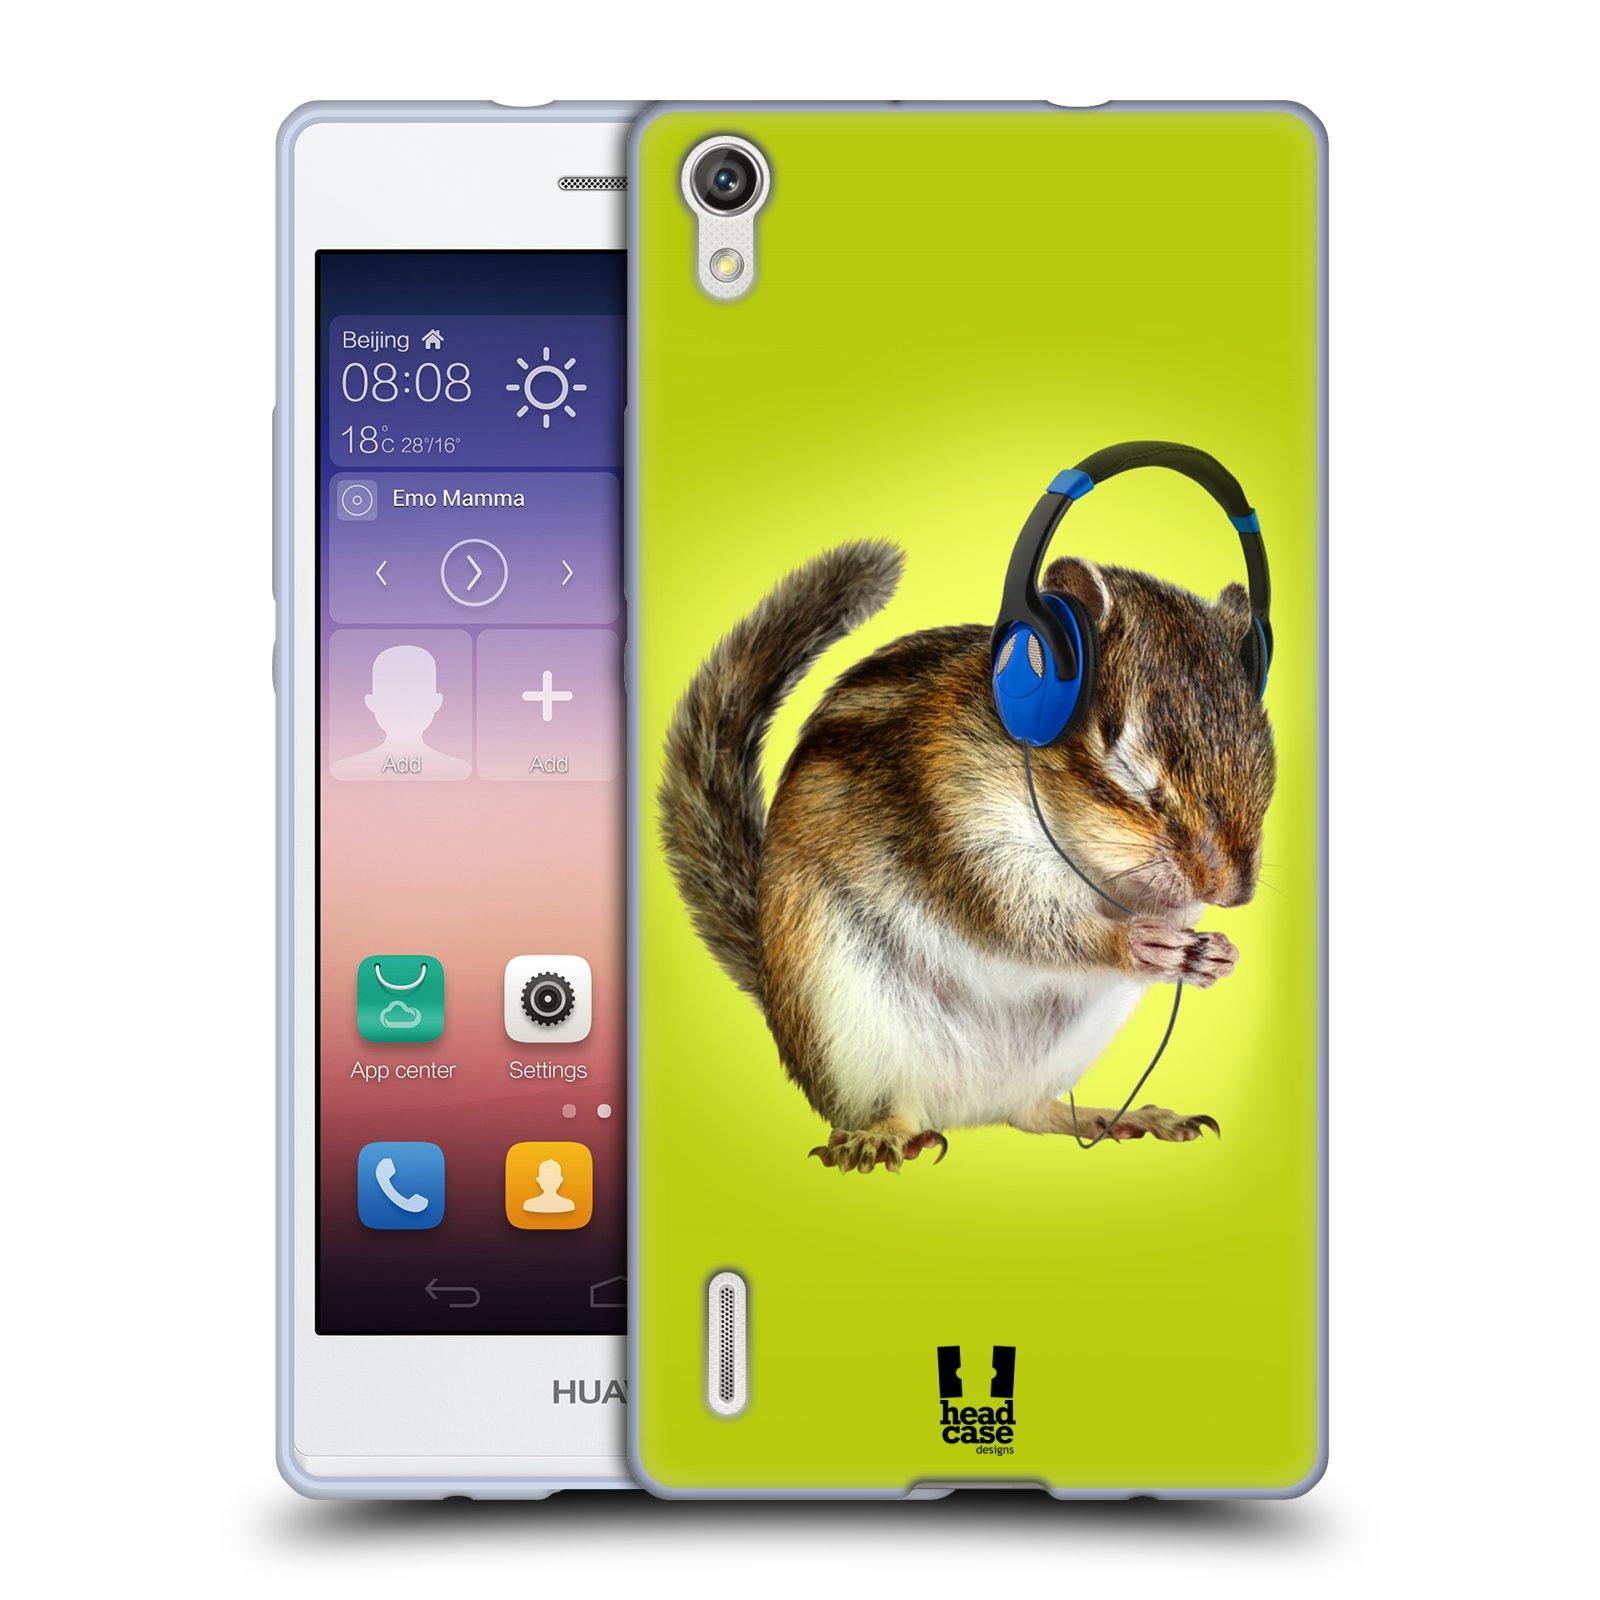 HEAD CASE silikonový obal na mobil HUAWEI Ascend P7 vzor Legrační zvířátka veverka se sluchátky